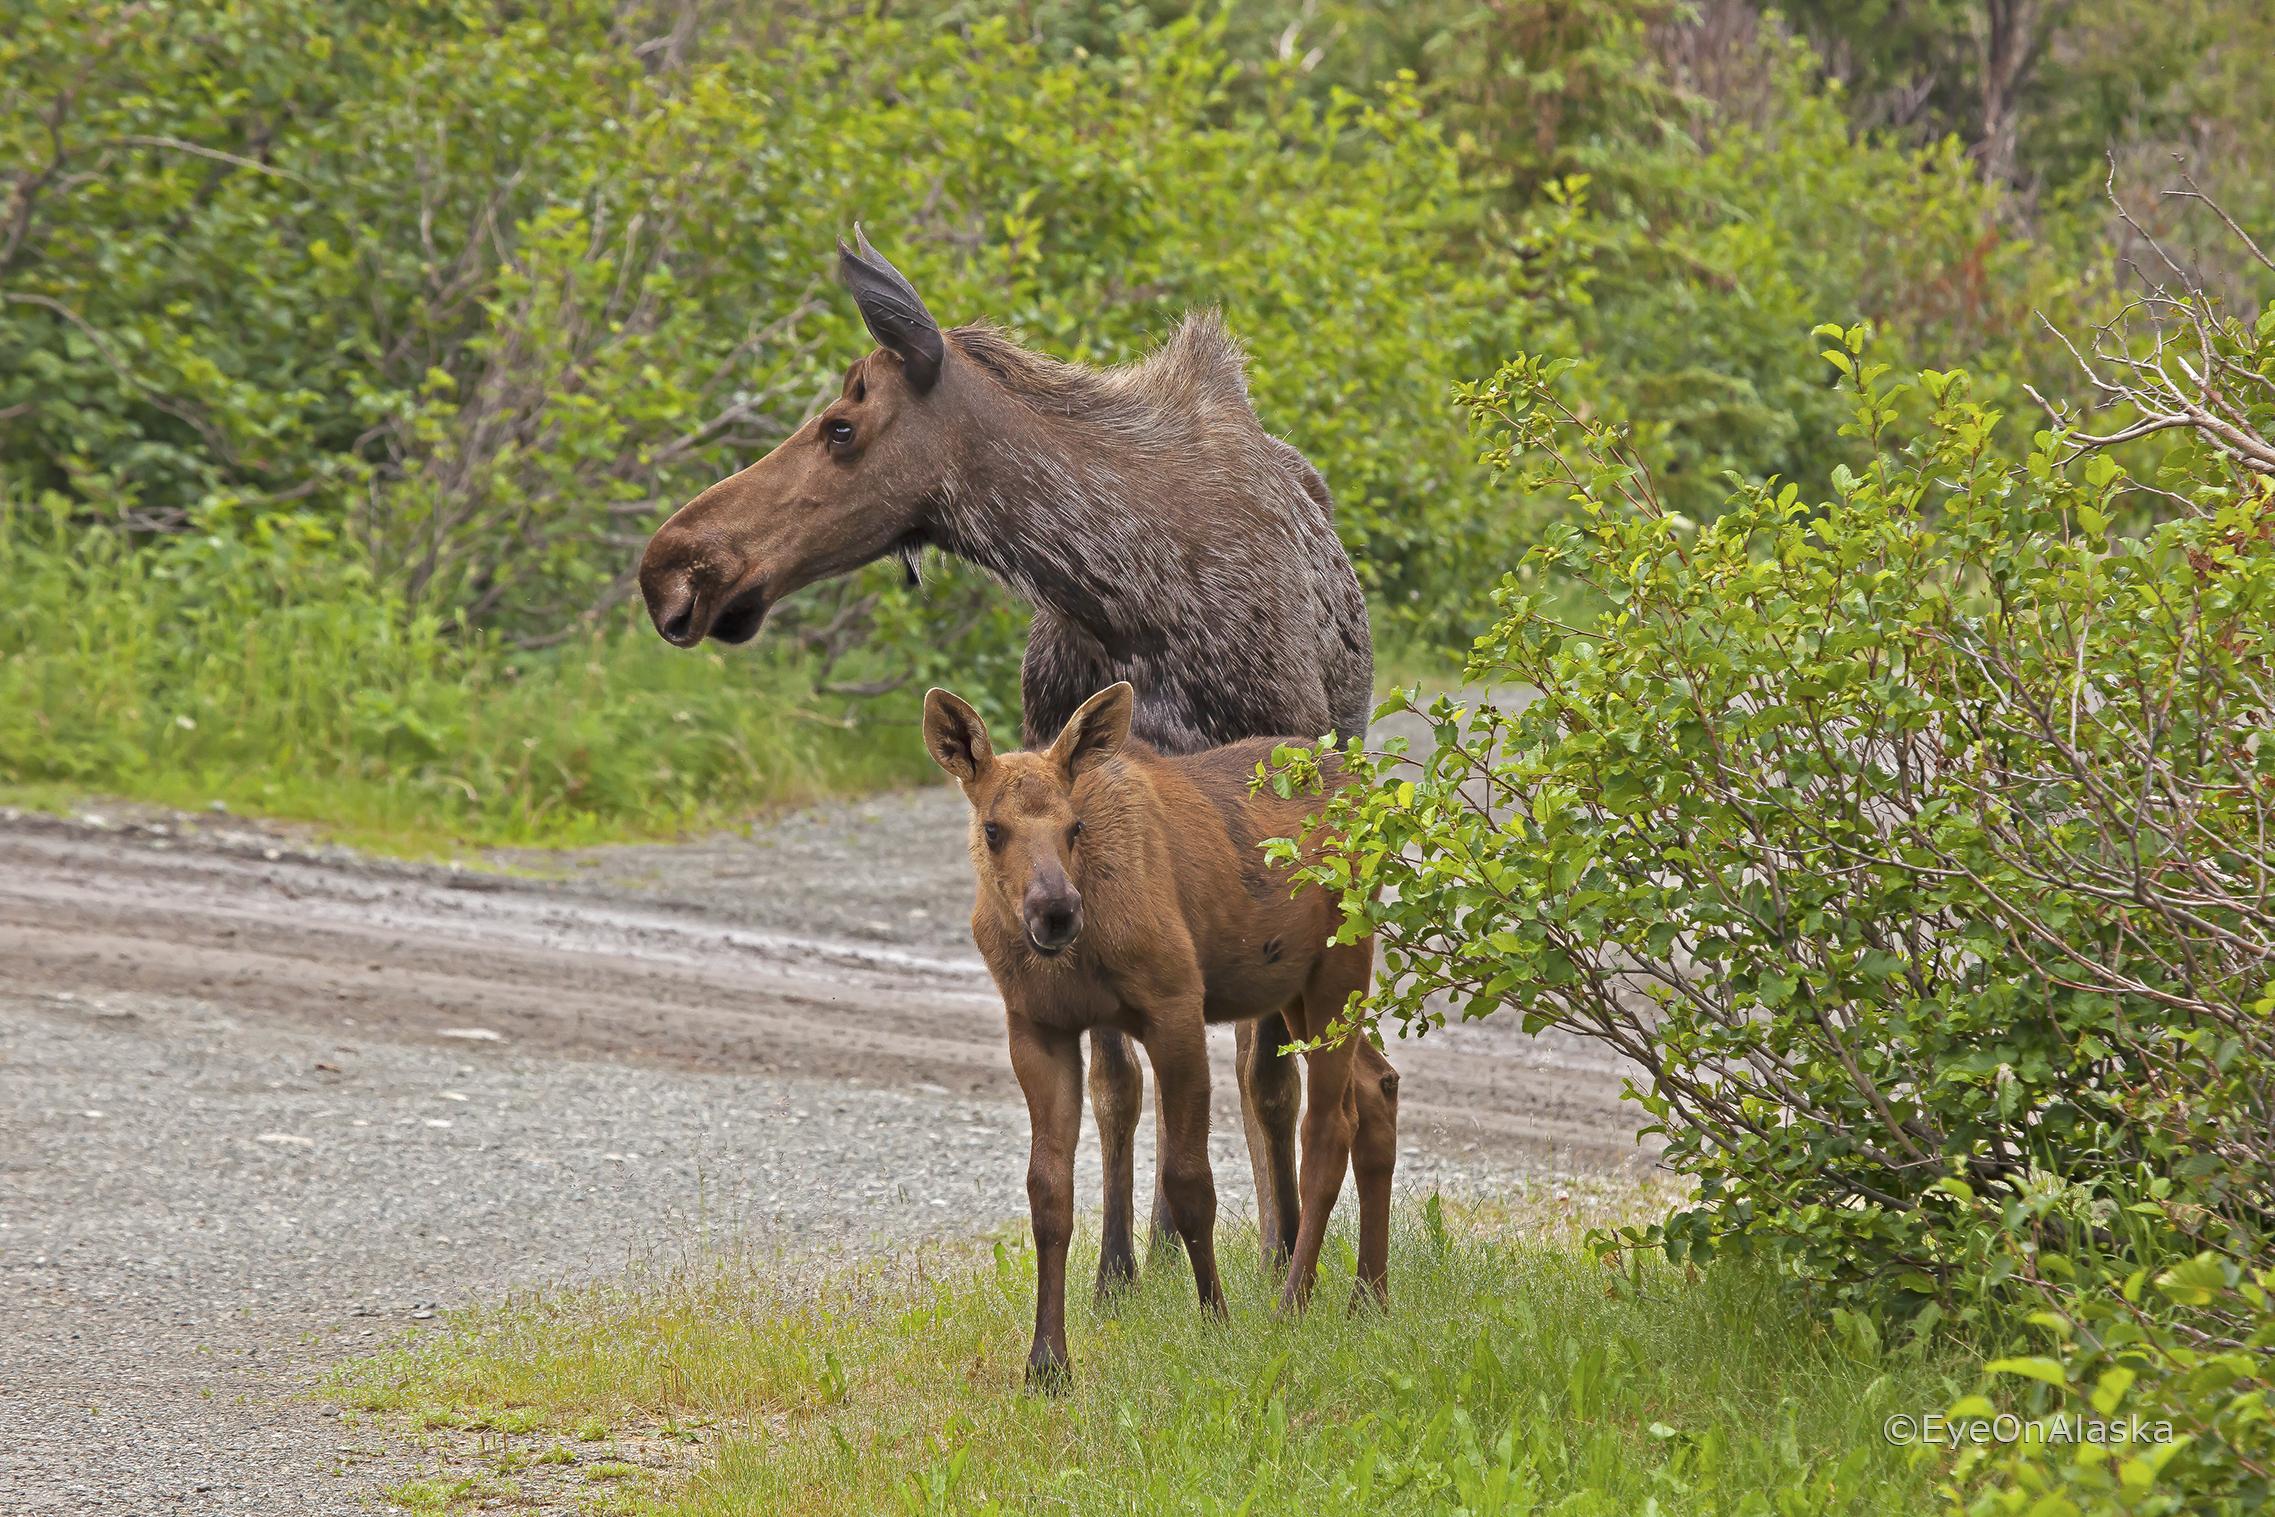 Mom & baby moose #1